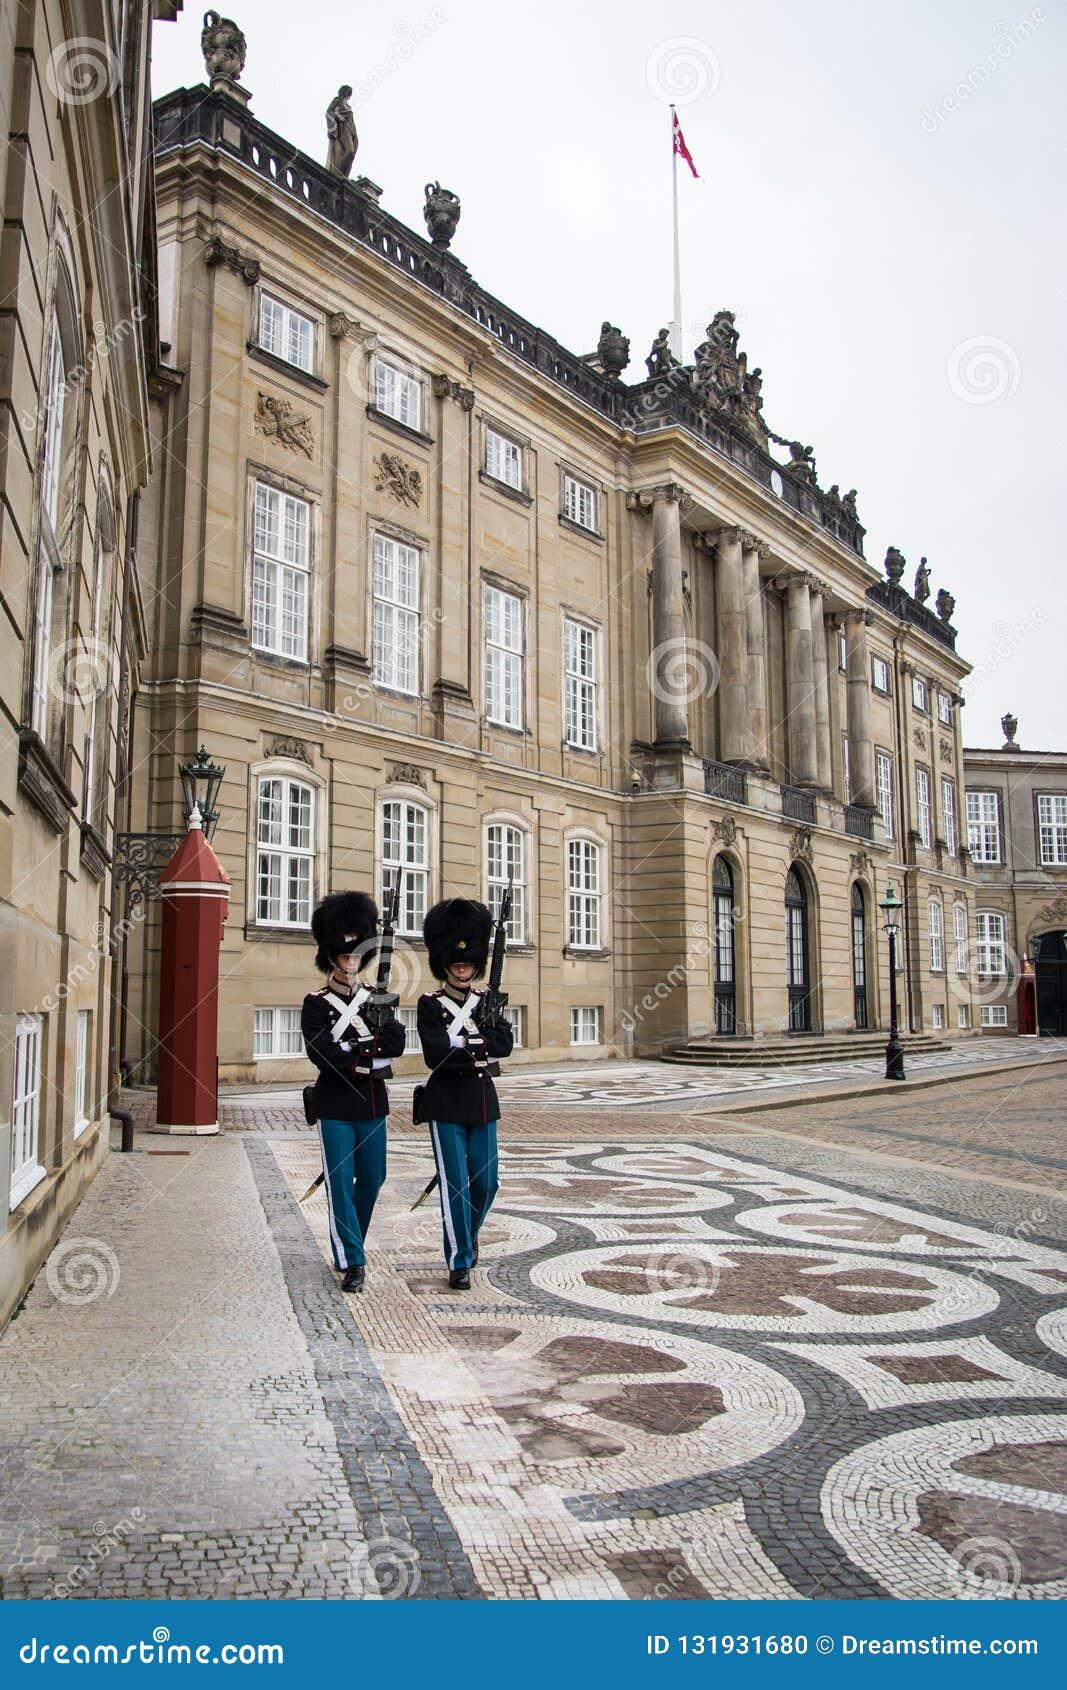 Guards at Amalienborg. The Royal home in Copenhagen. Denmark